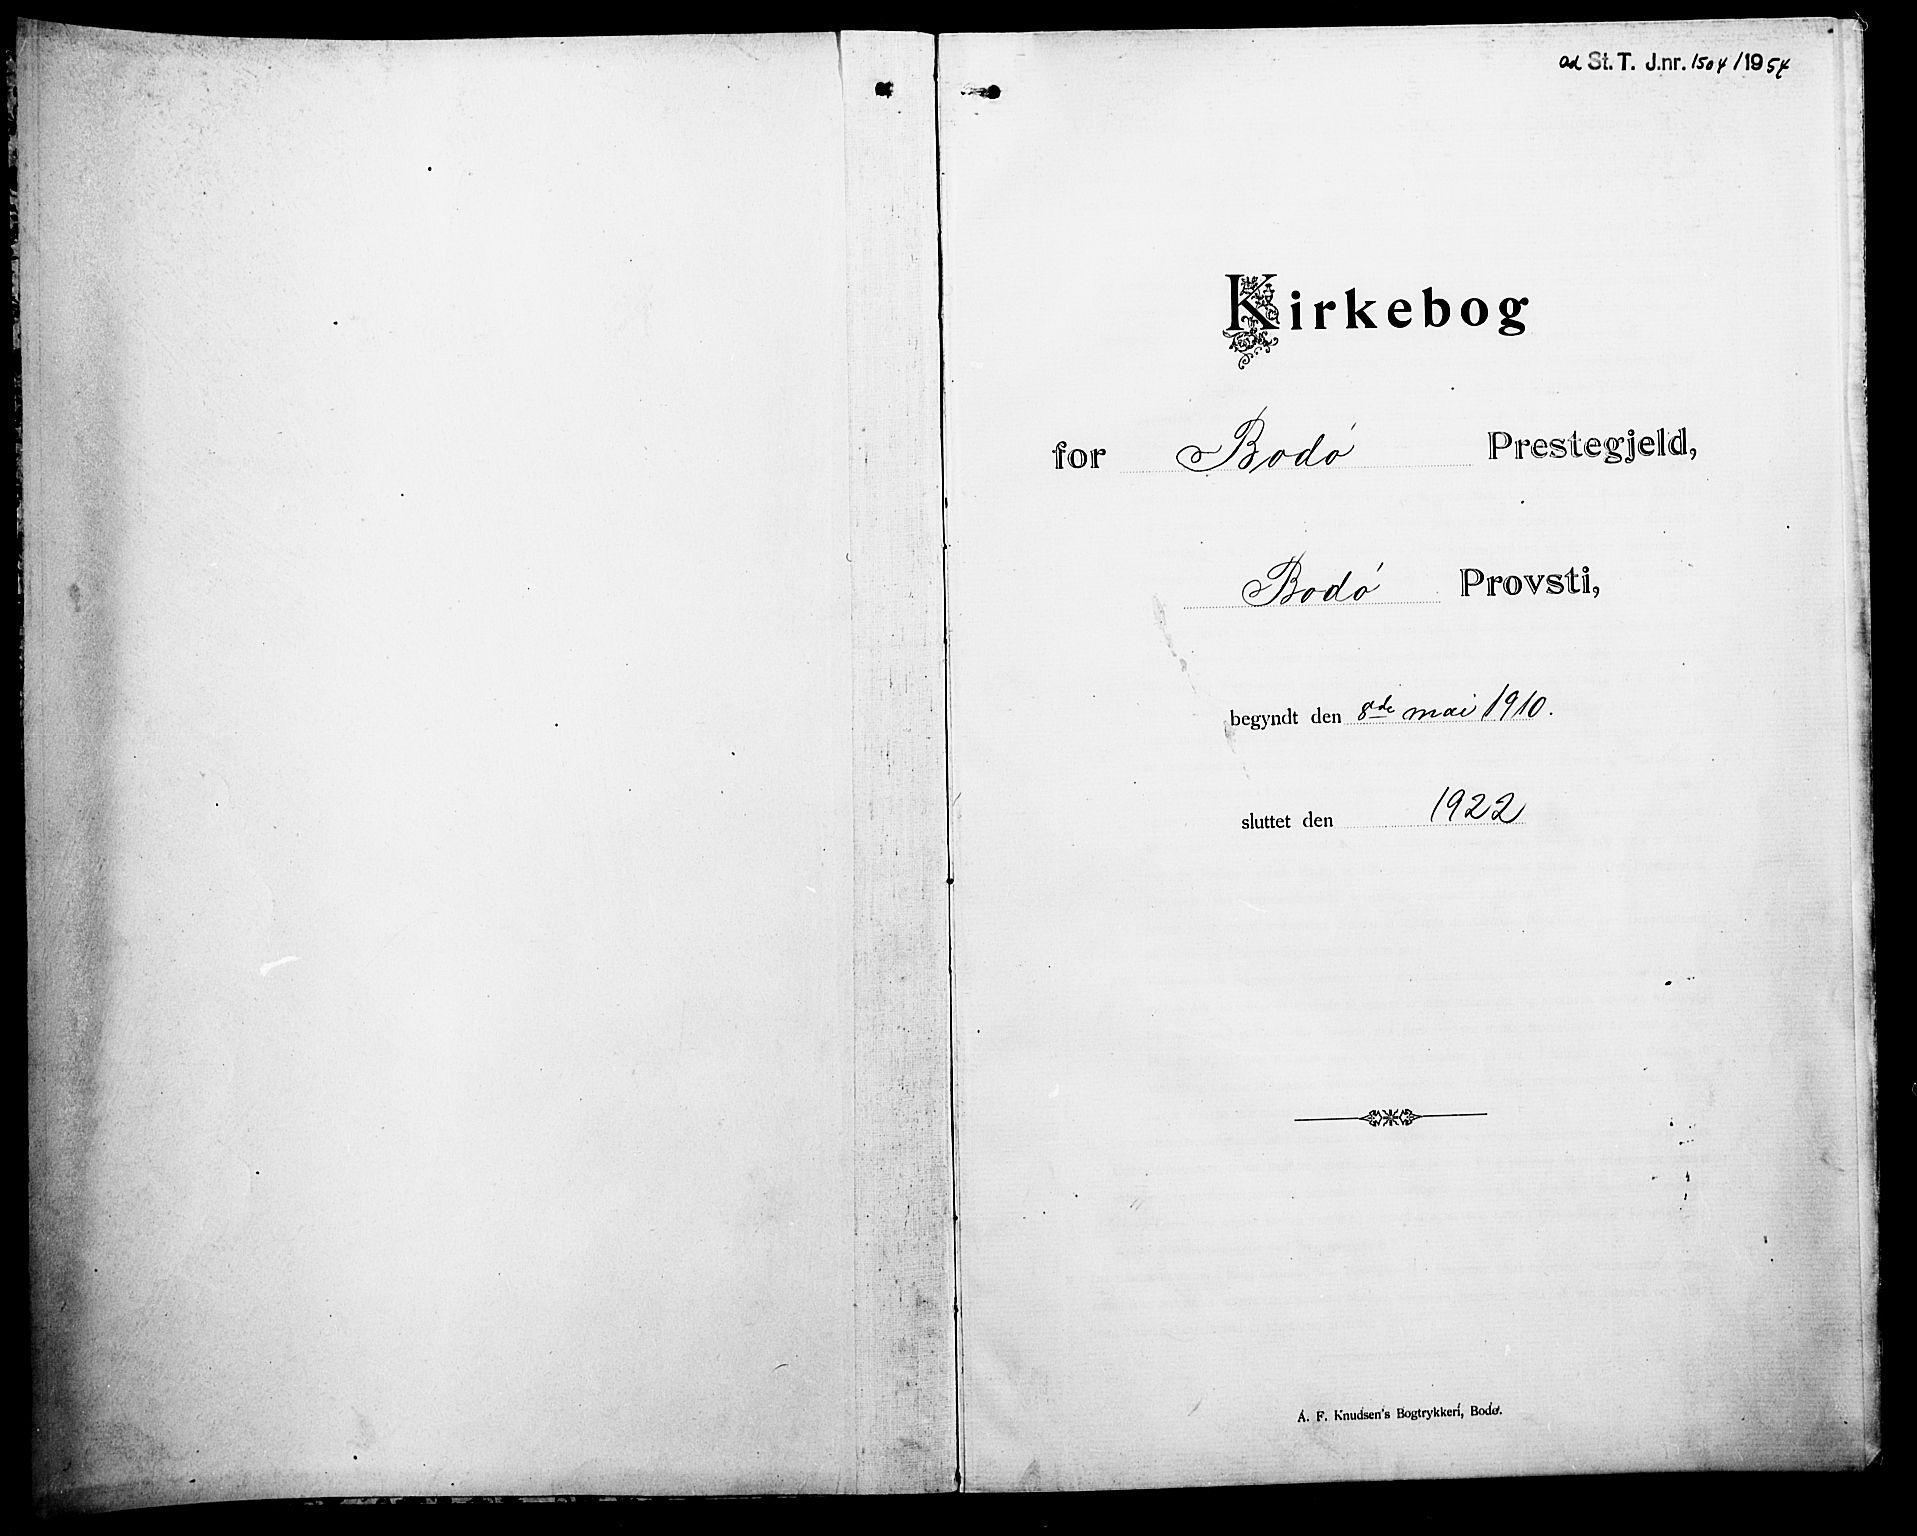 SAT, Ministerialprotokoller, klokkerbøker og fødselsregistre - Nordland, 801/L0034: Klokkerbok nr. 801C09, 1910-1922